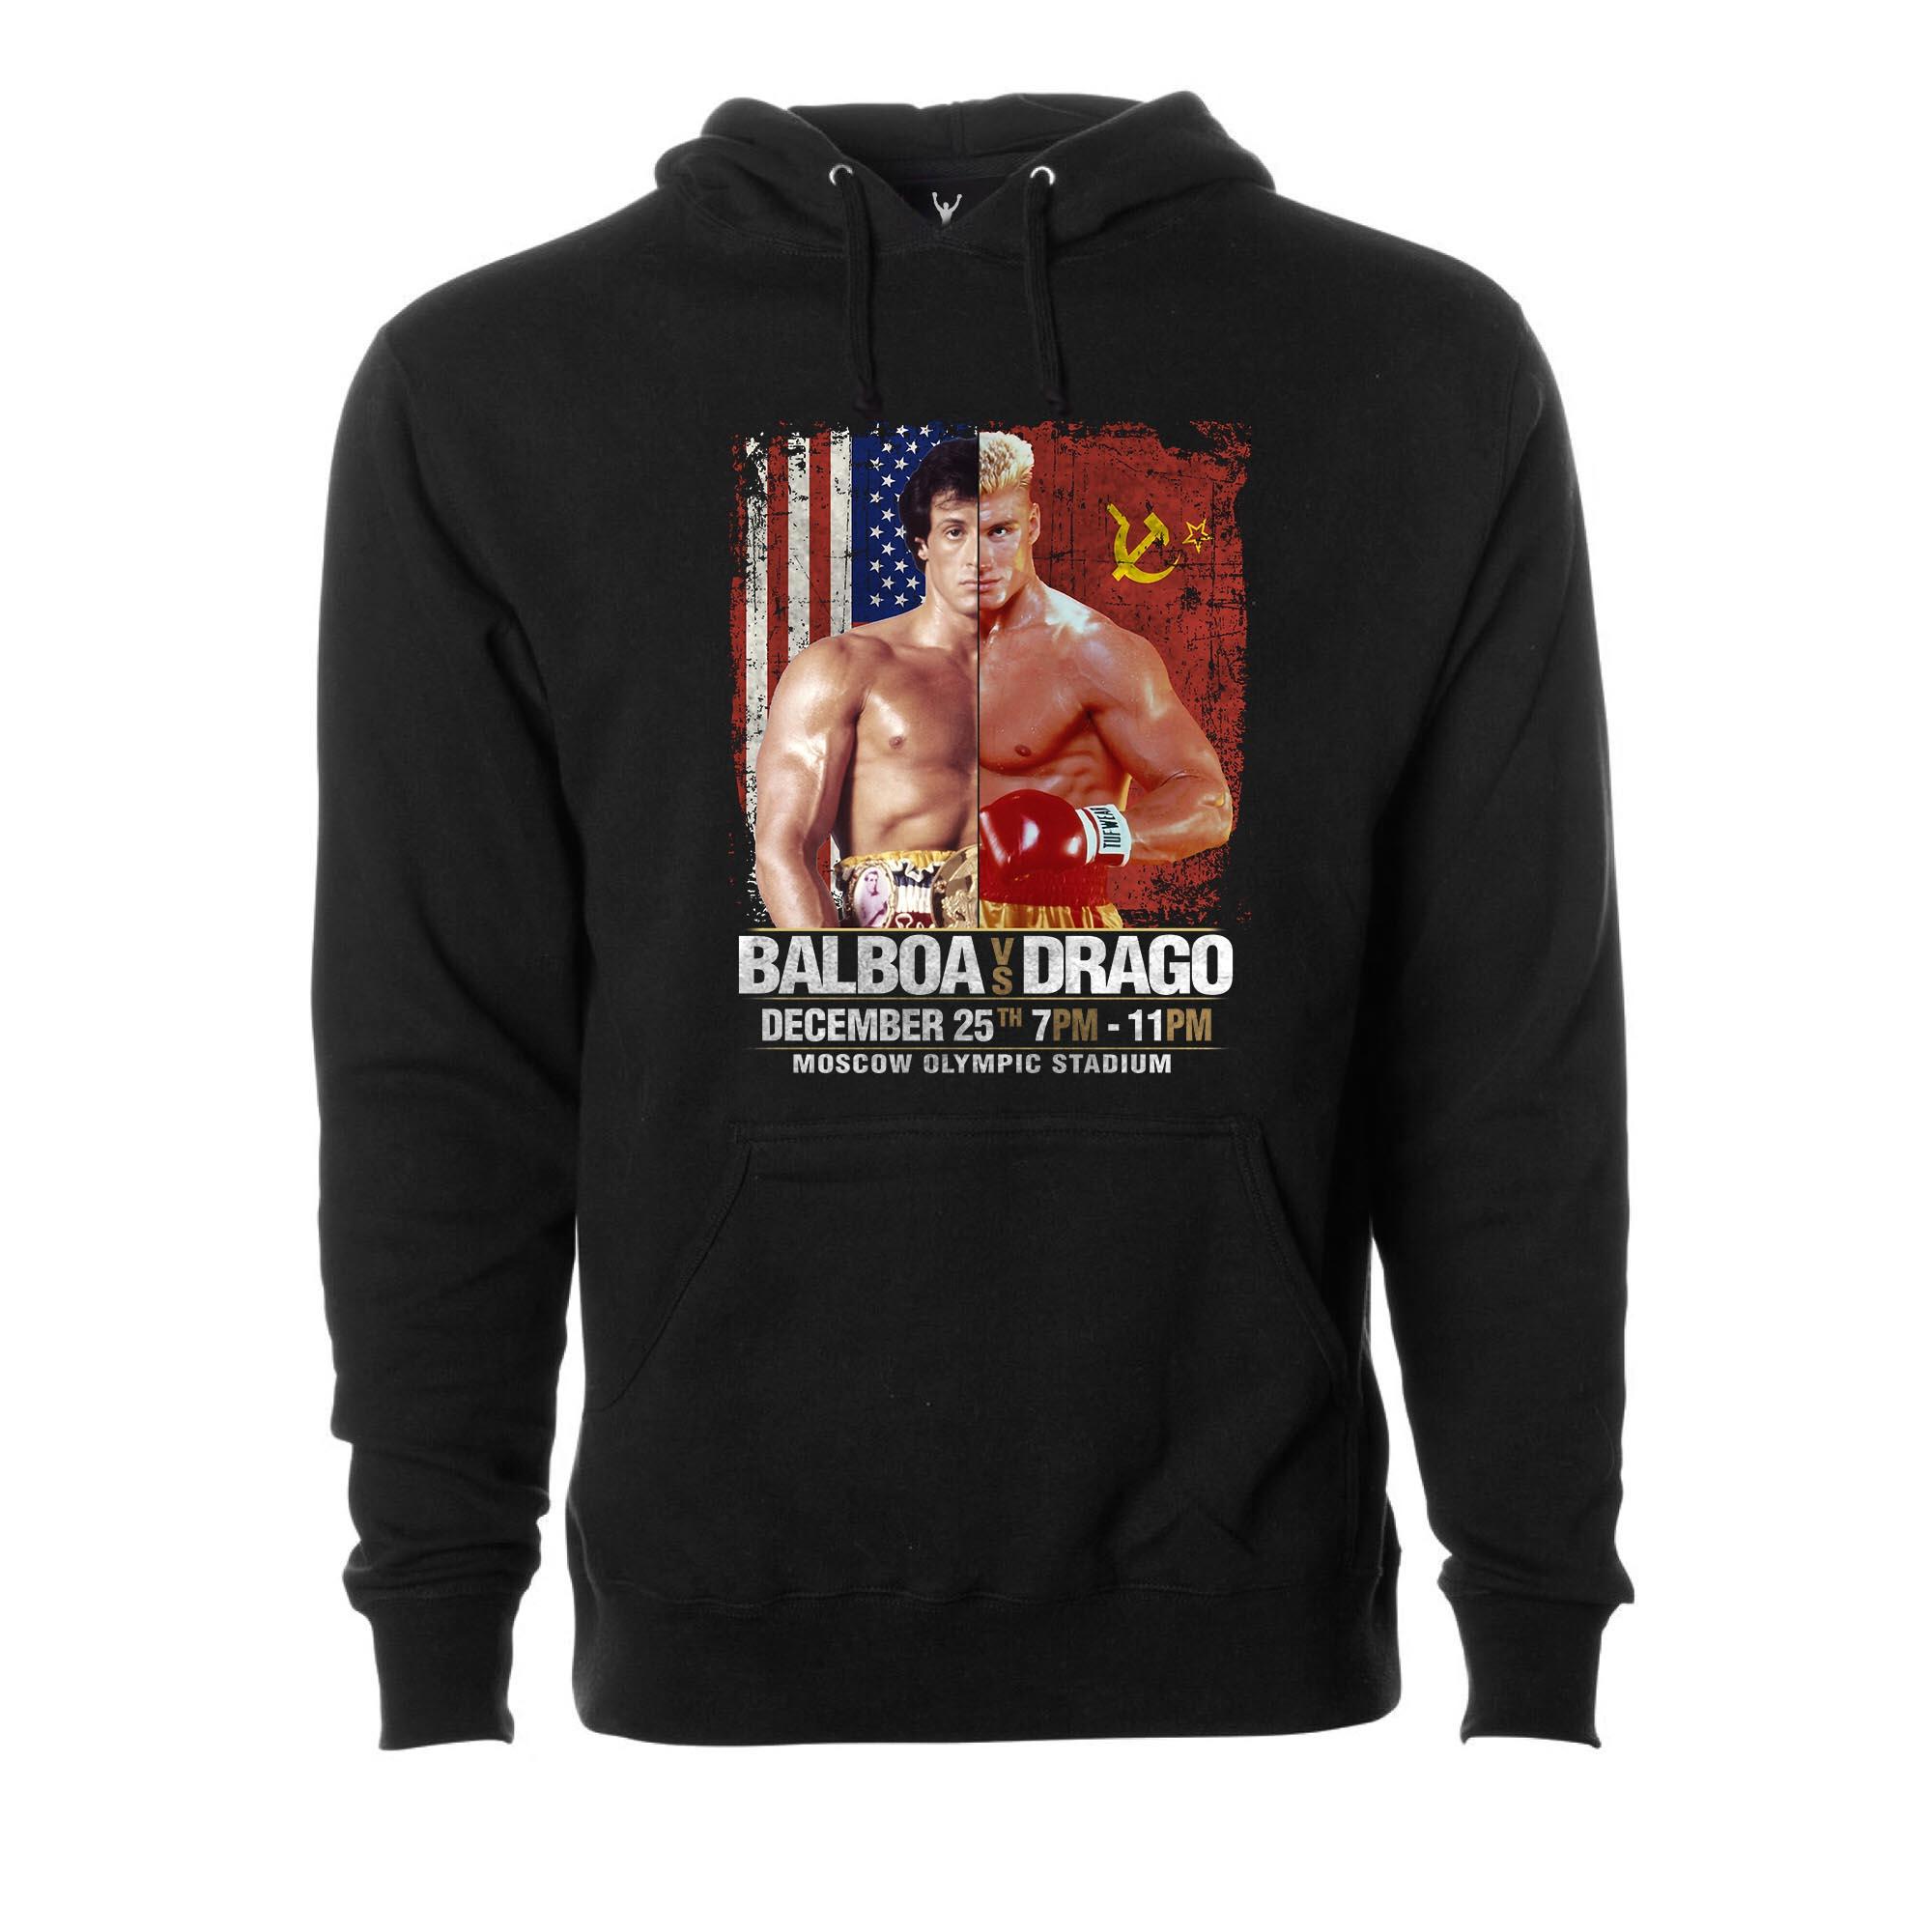 Balboa vs. Drago Pullover Hoodie